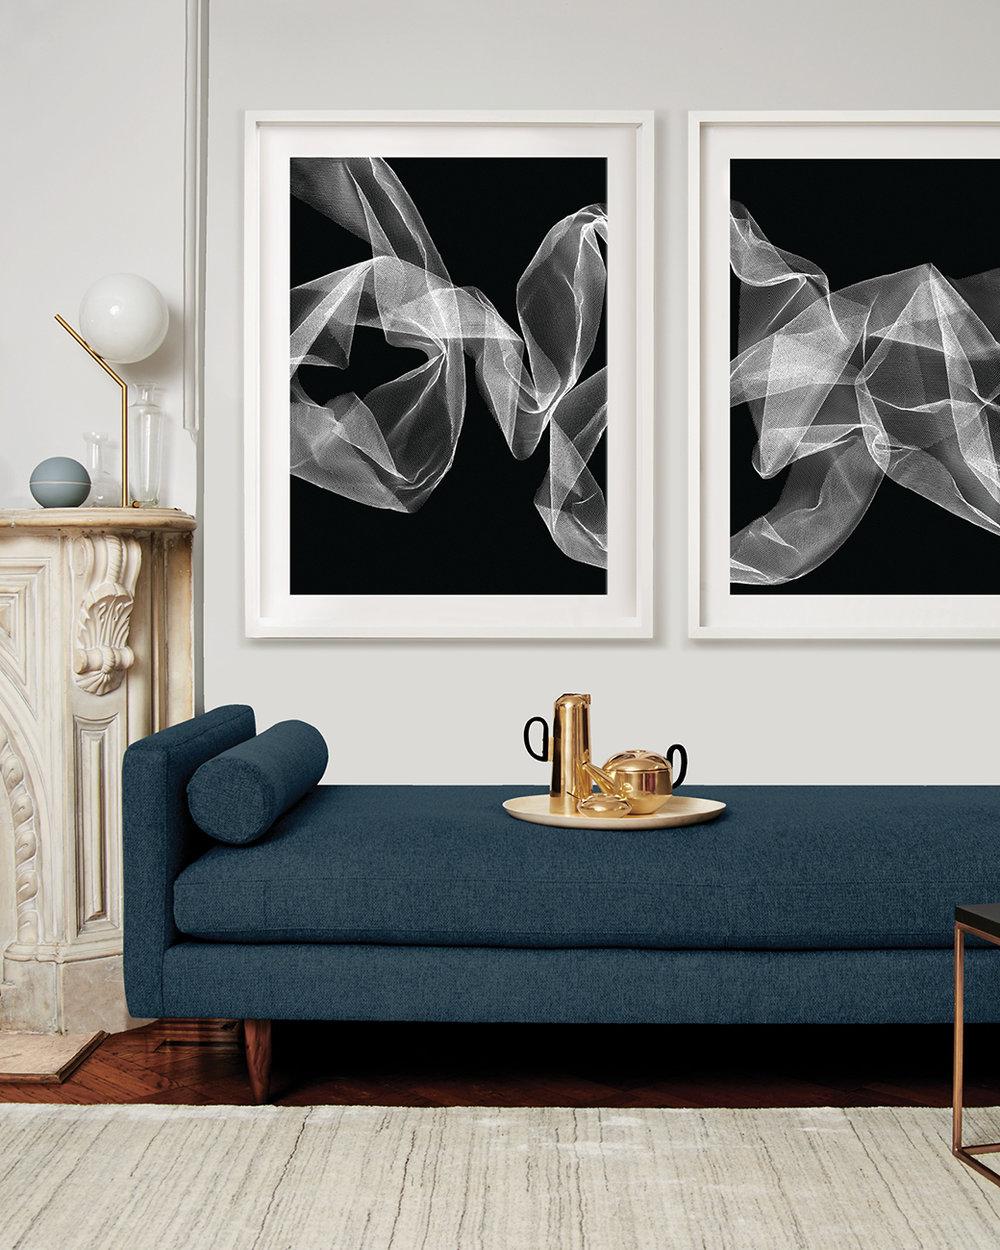 02_Living_Room_Interior_Edition3_Diptych.jpg